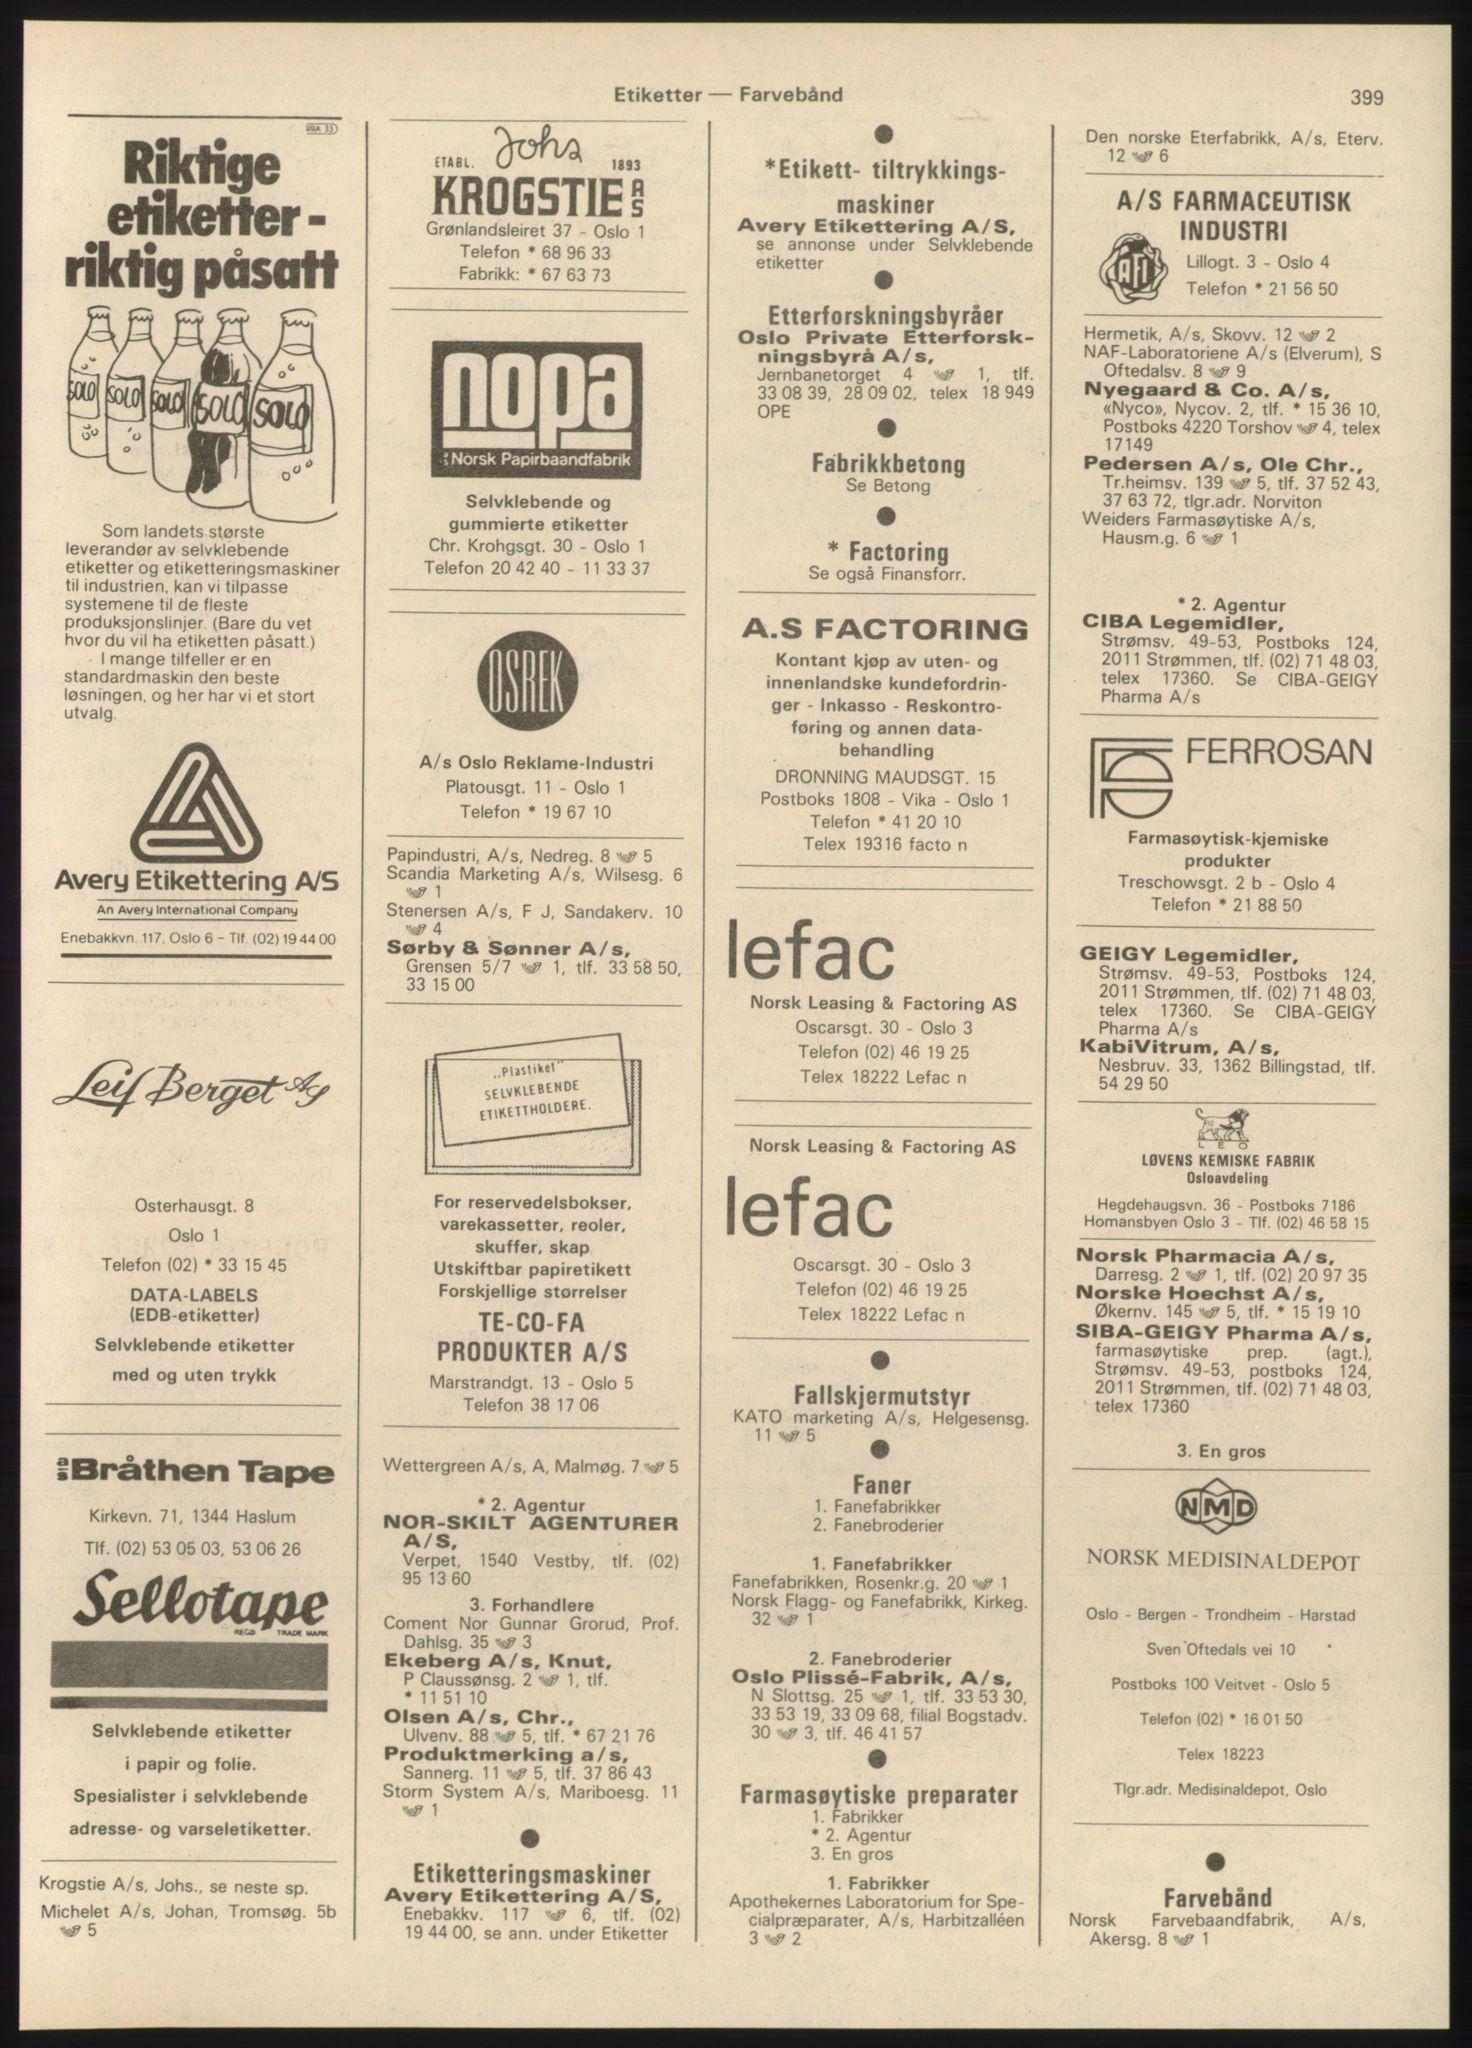 PUBL, Kristiania/Oslo adressebok, 1980-1981, p. 399